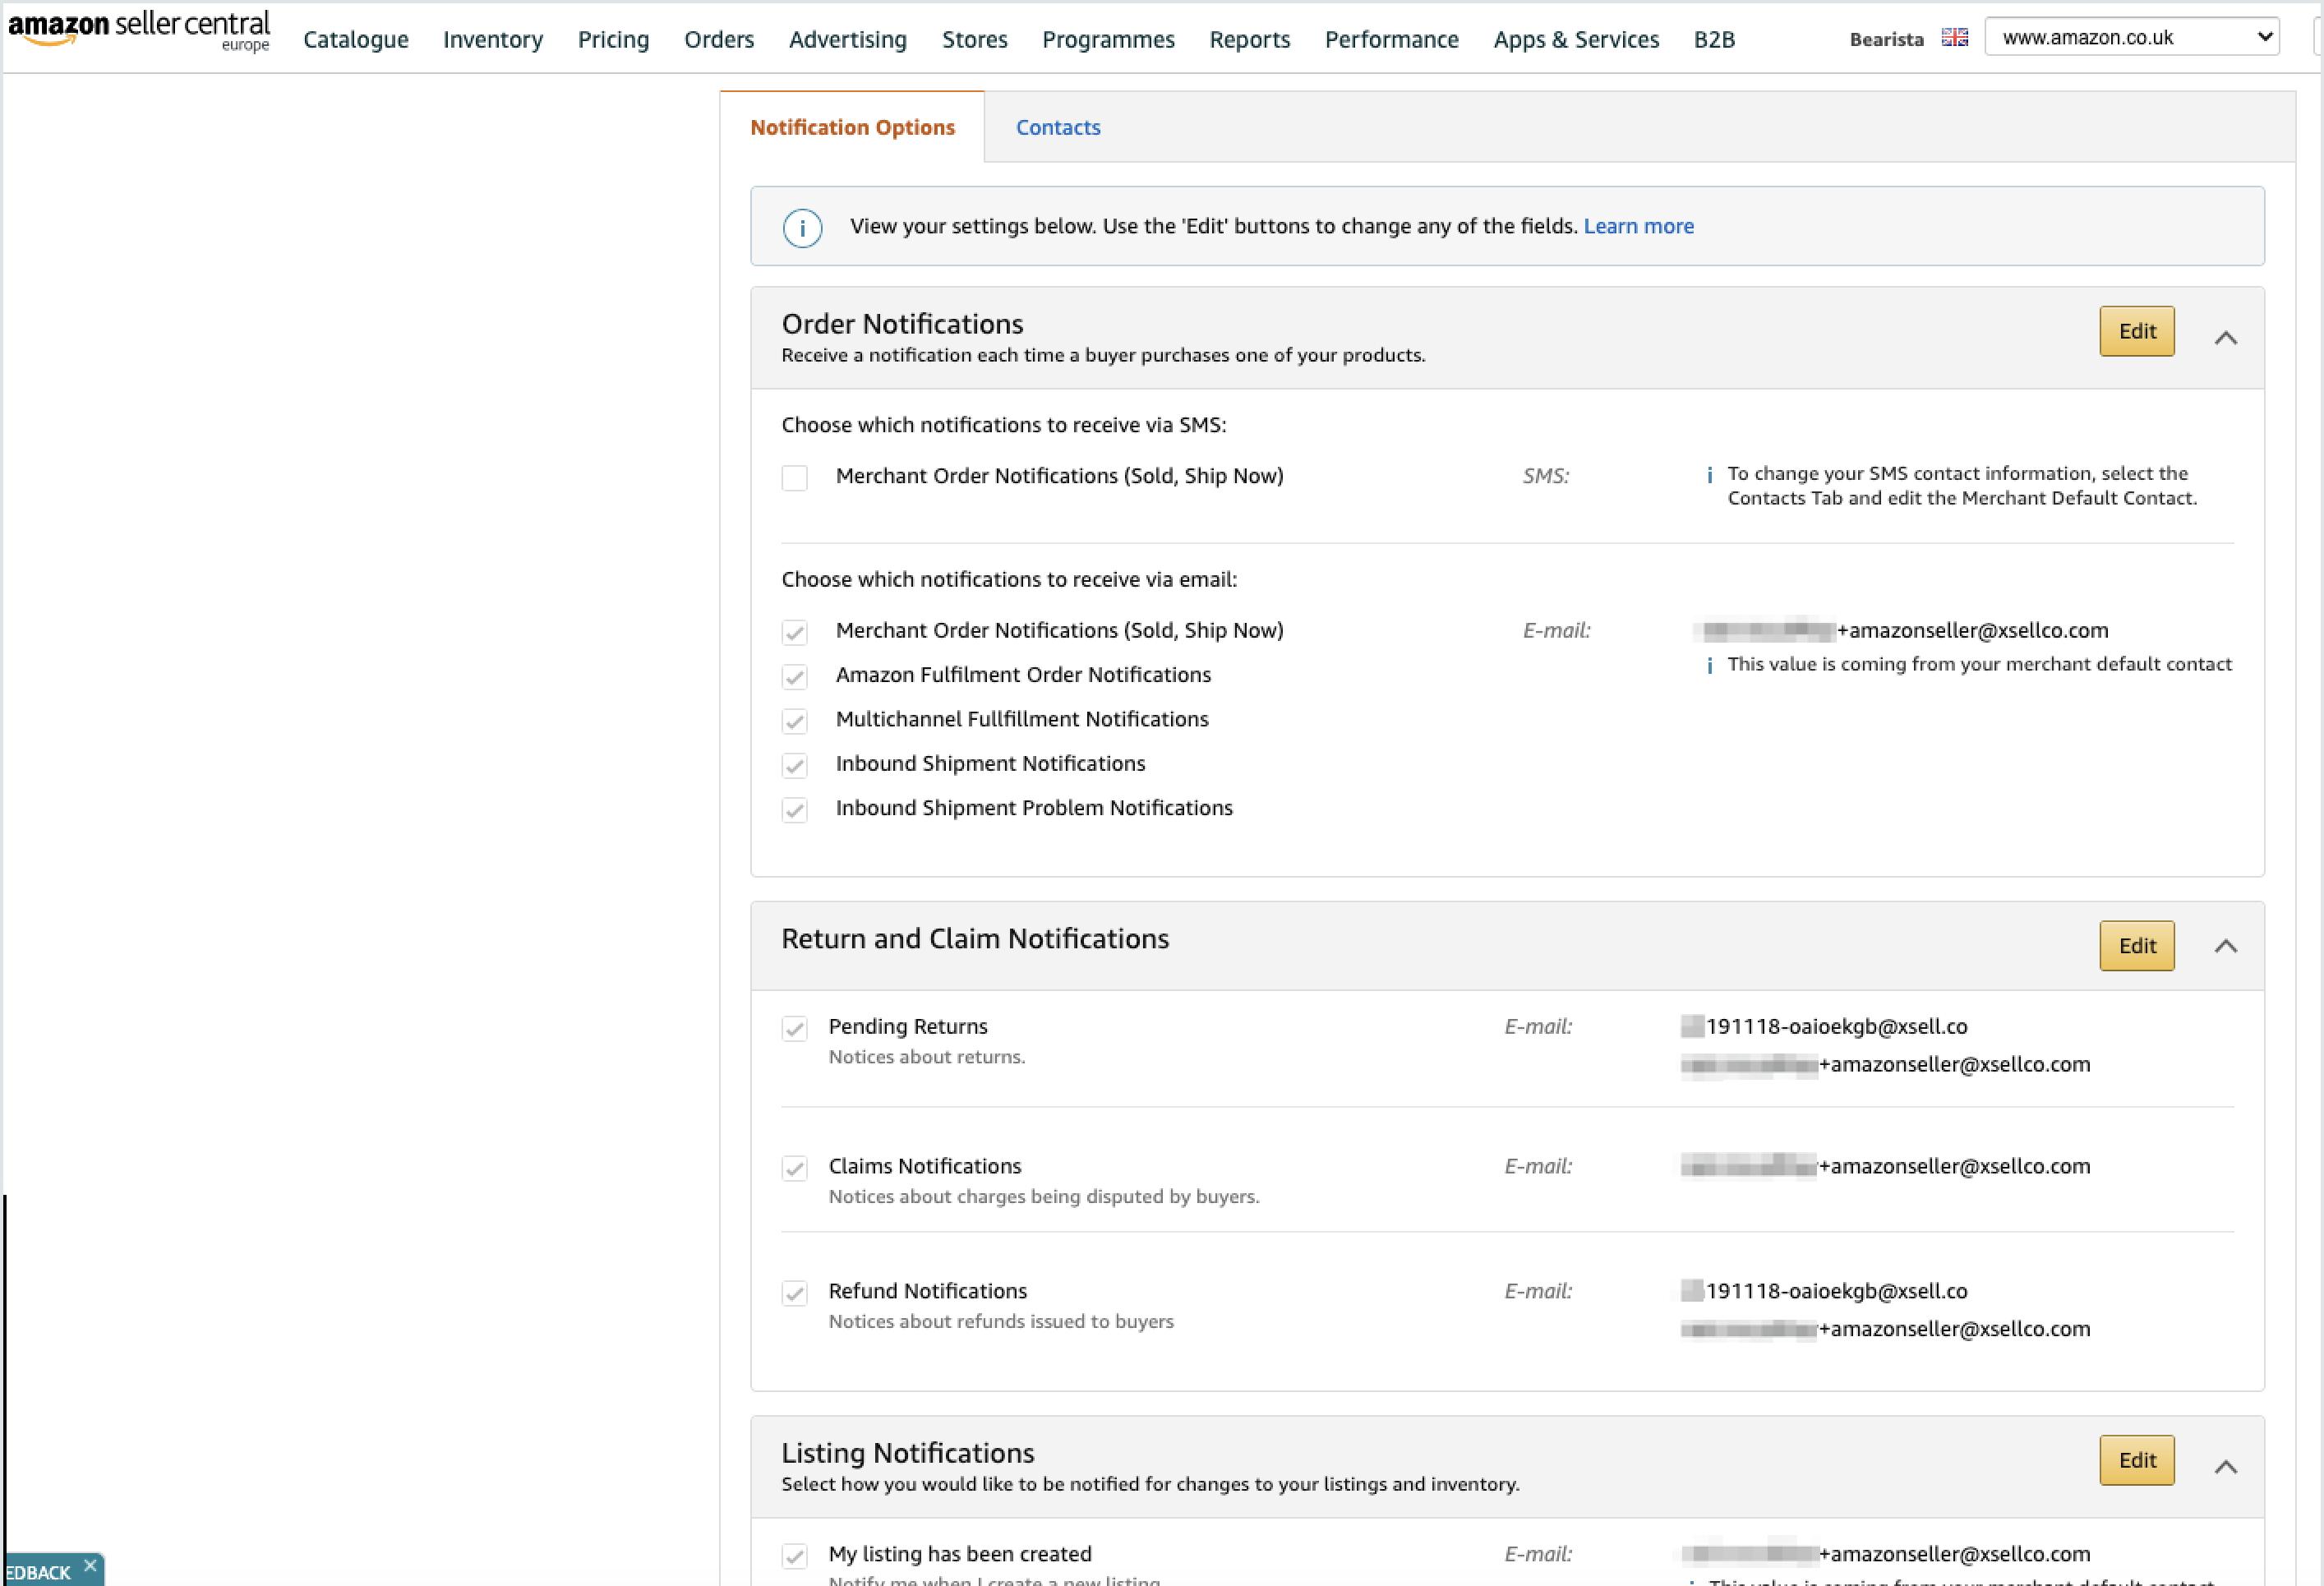 Amazon settings page